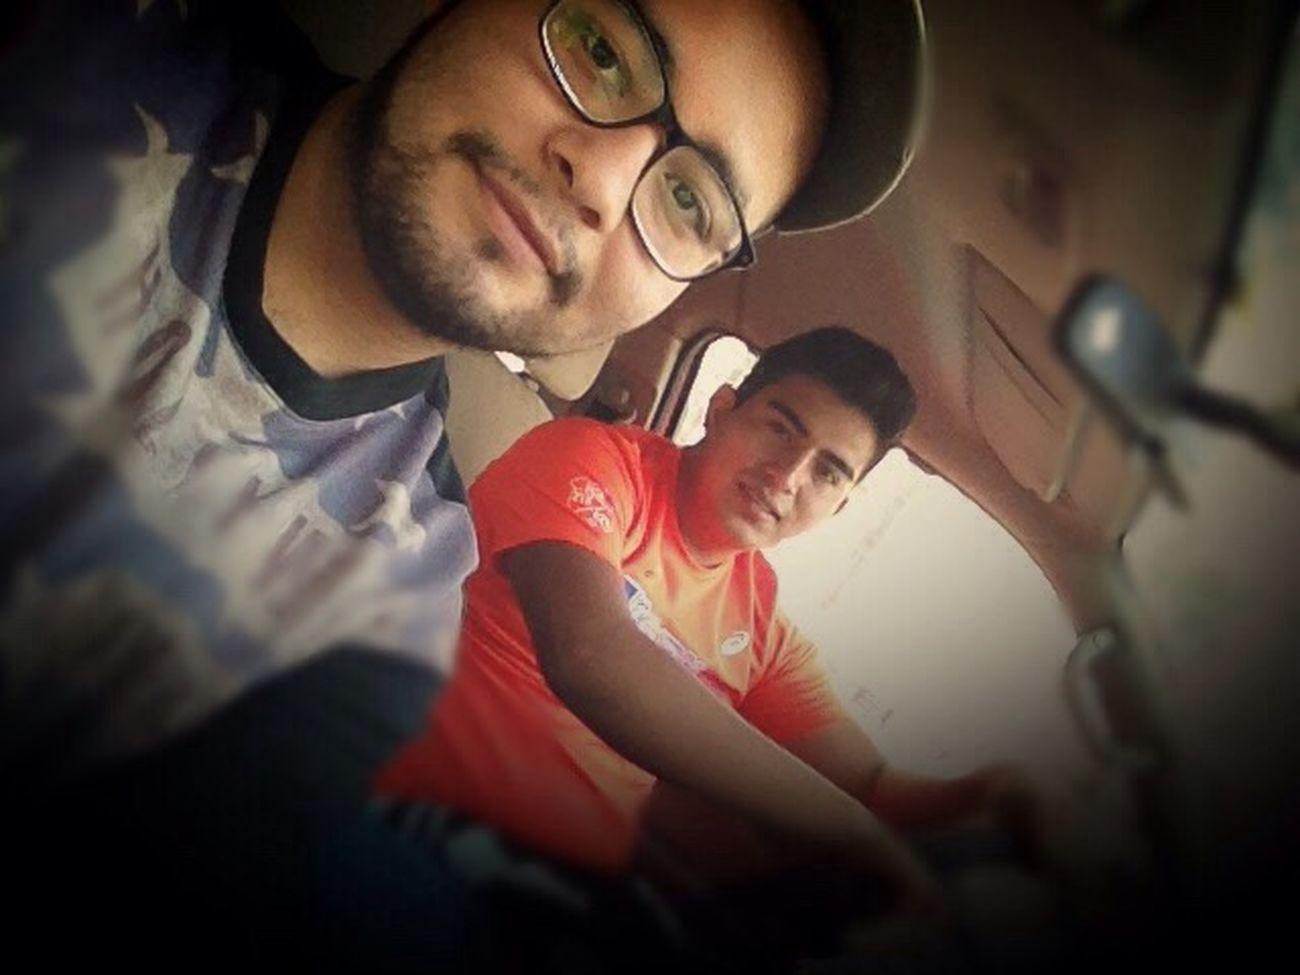 On Our Way Bestoftheday Trip Friendstime